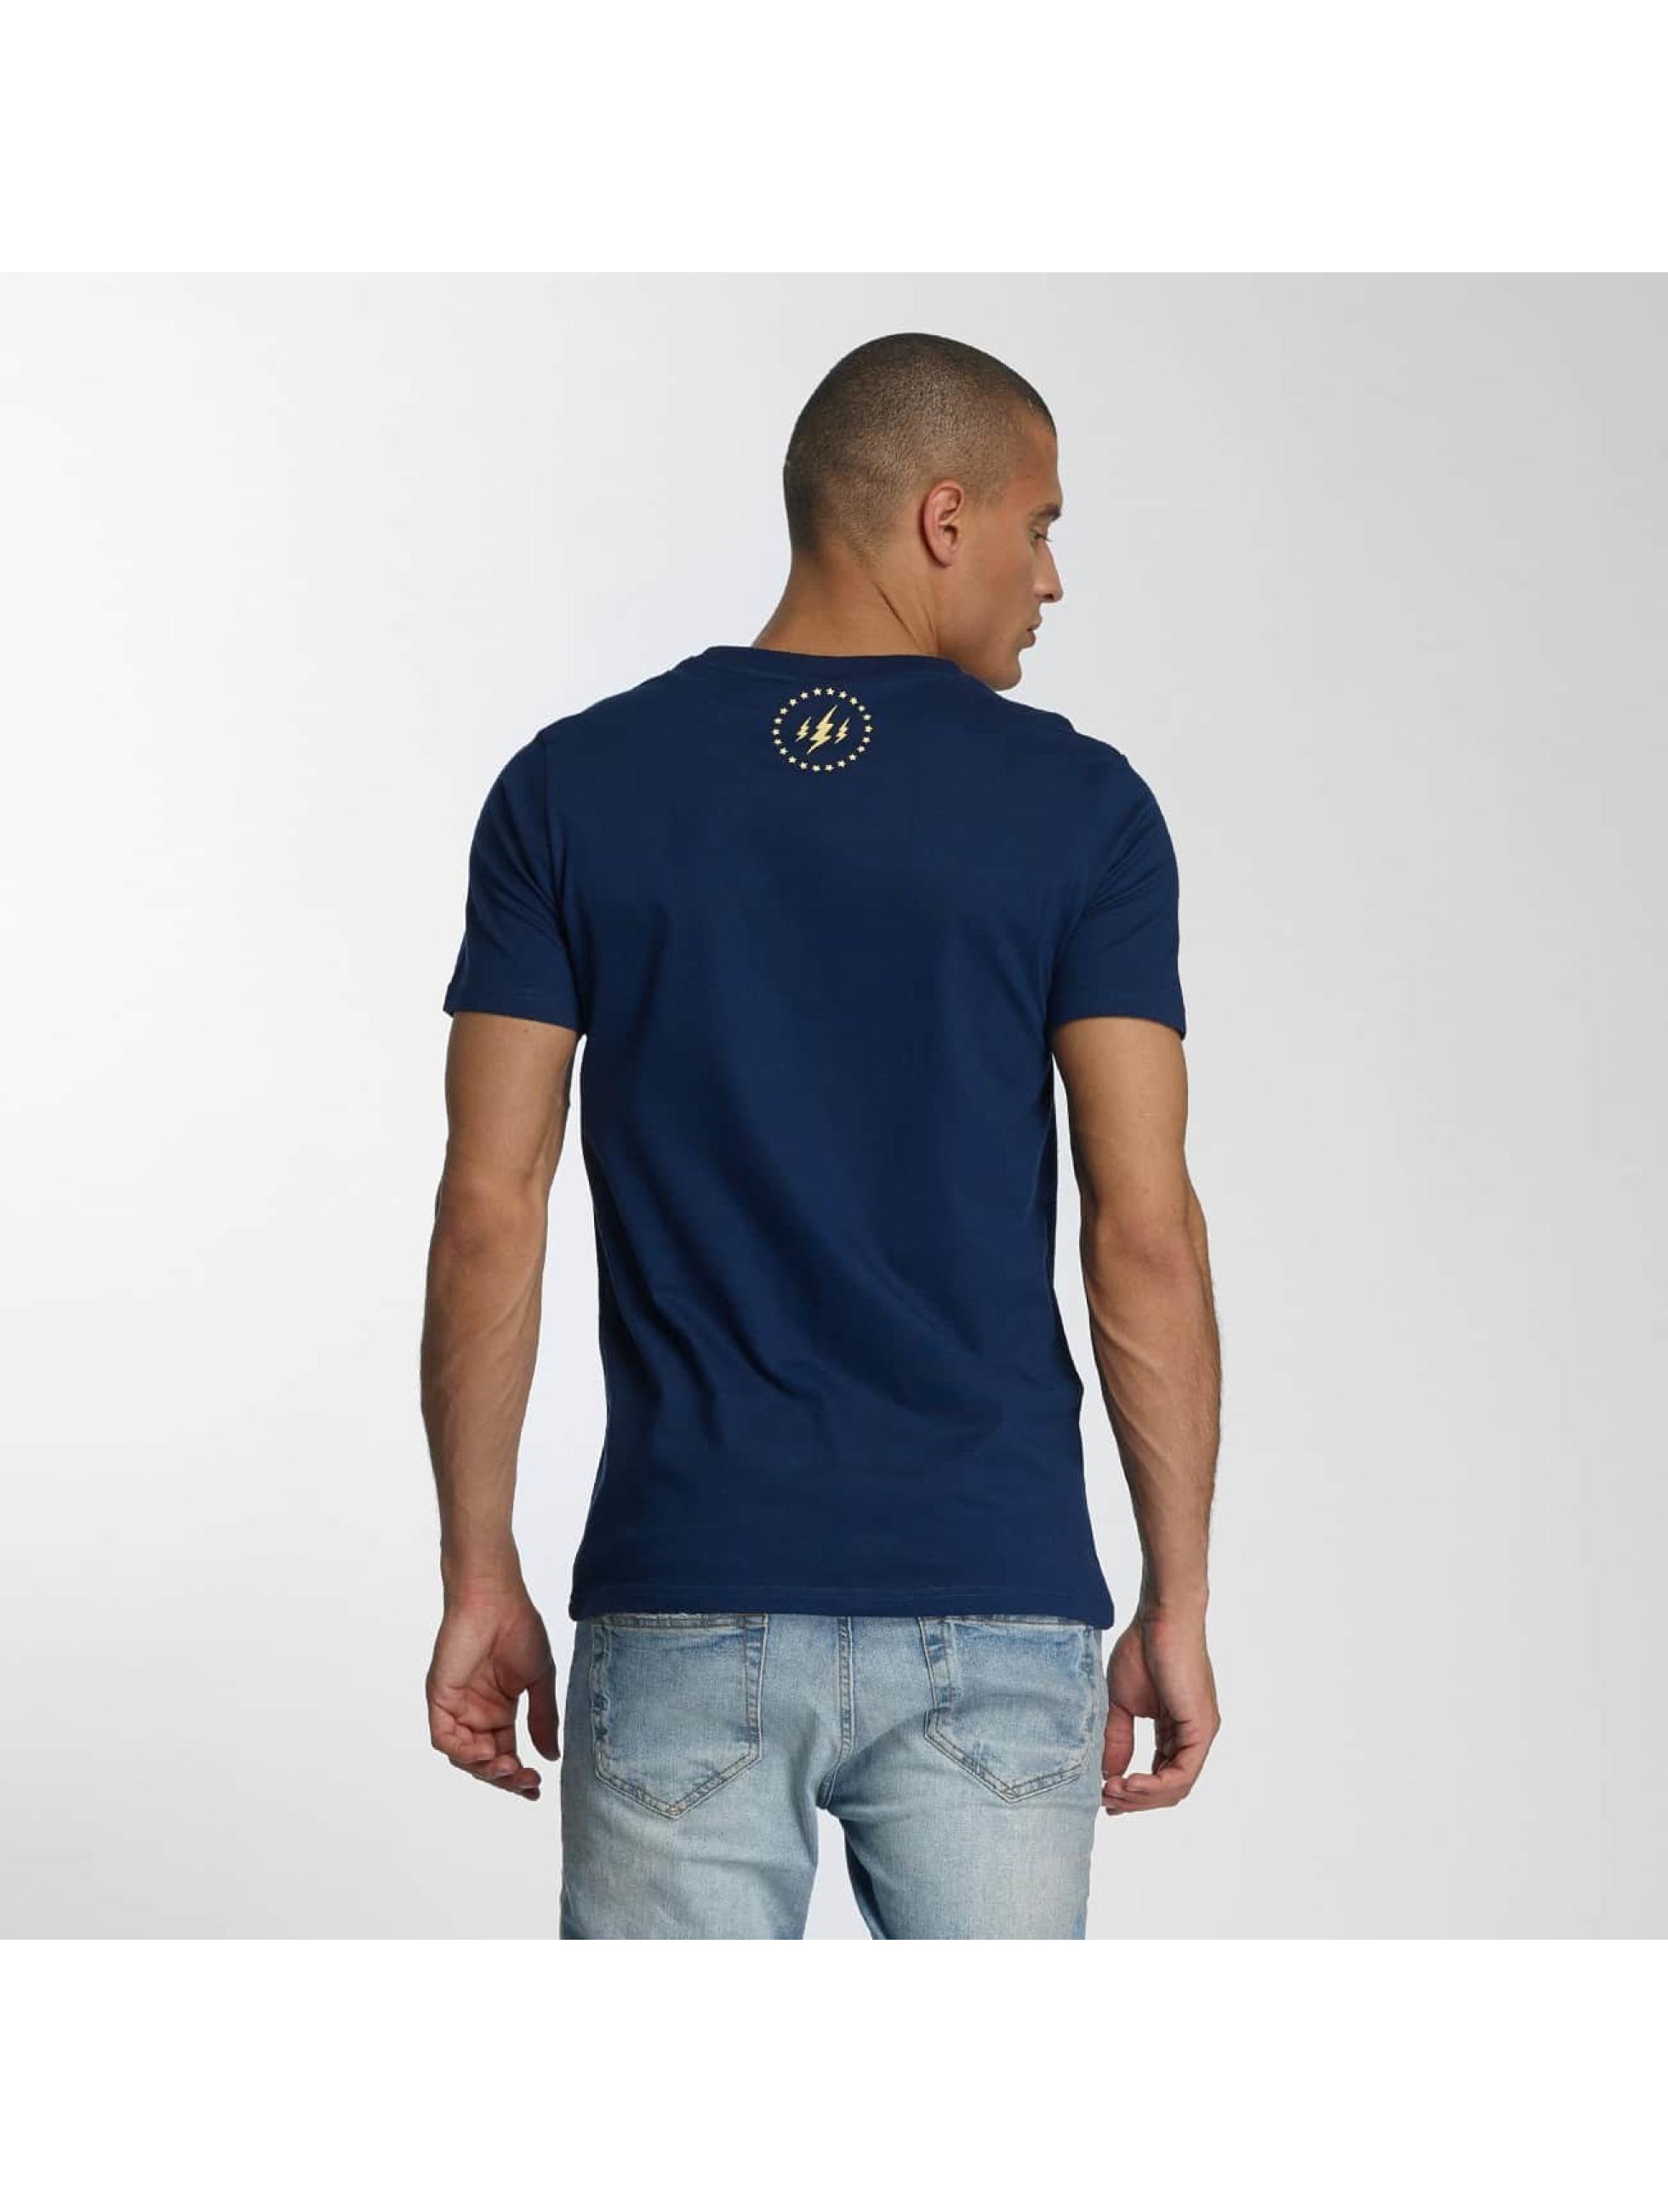 TrueSpin Tričká 8 modrá